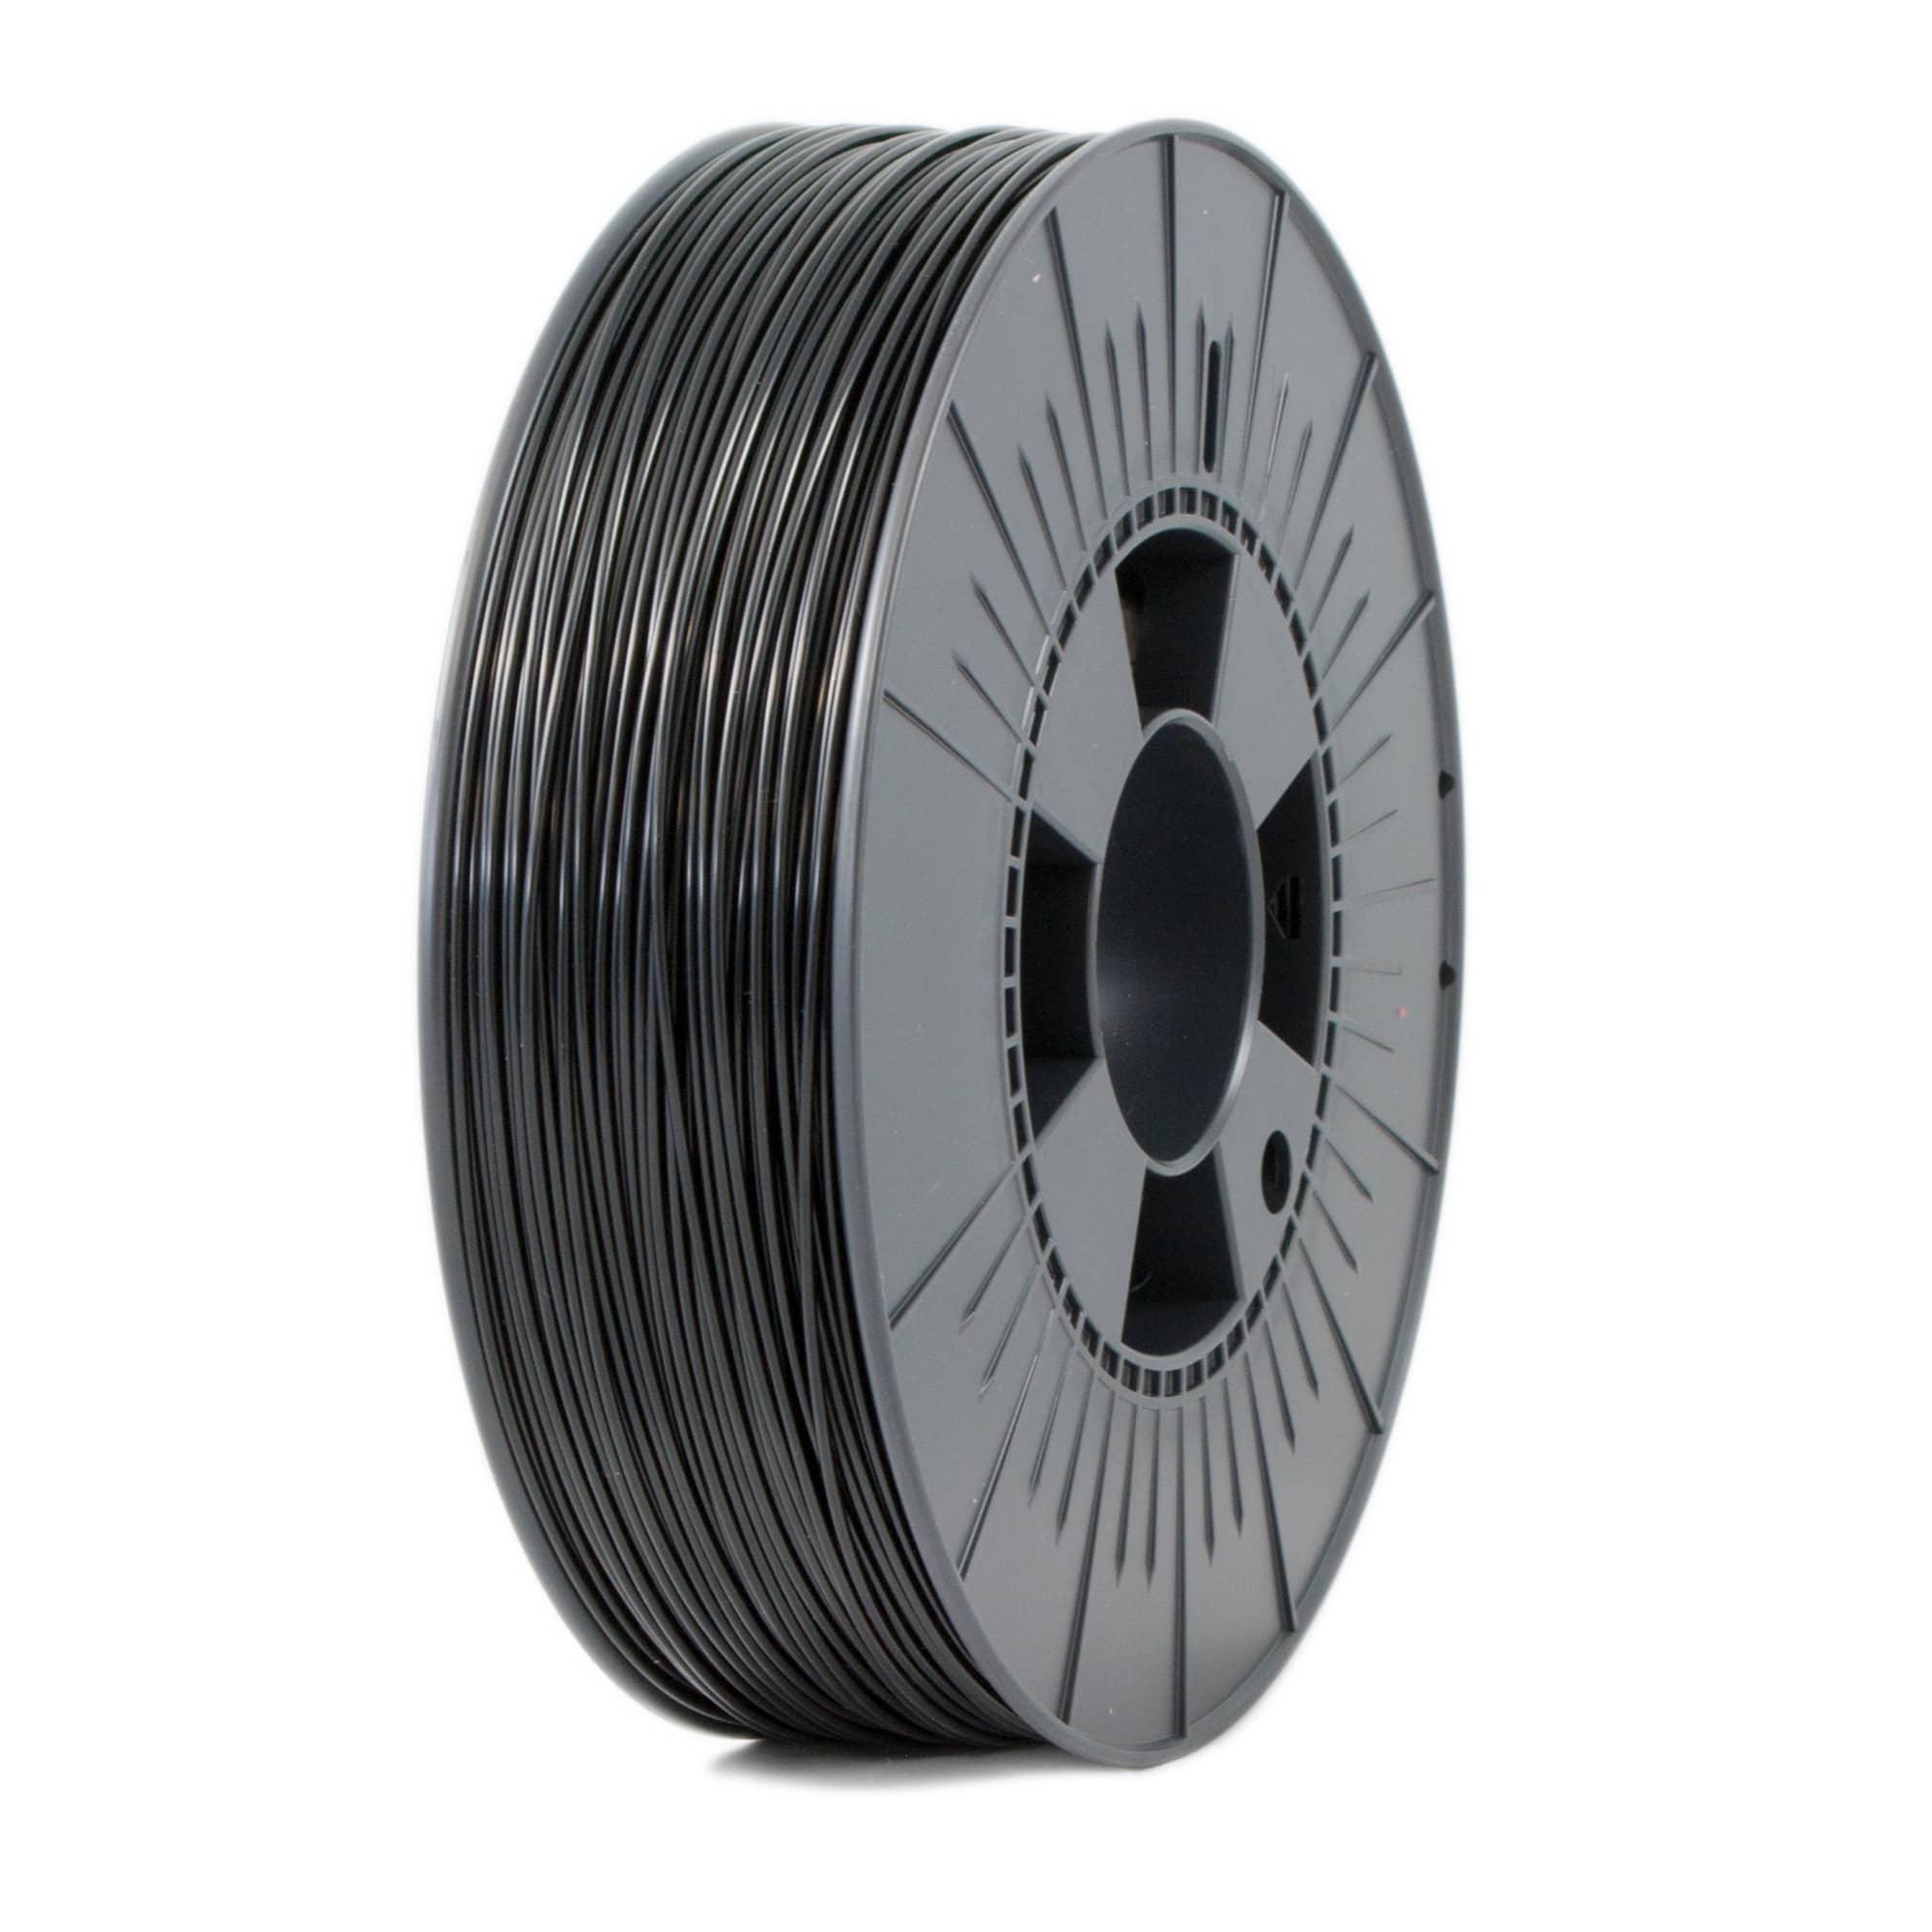 BioPC 500g – Black 3D Printer Filament